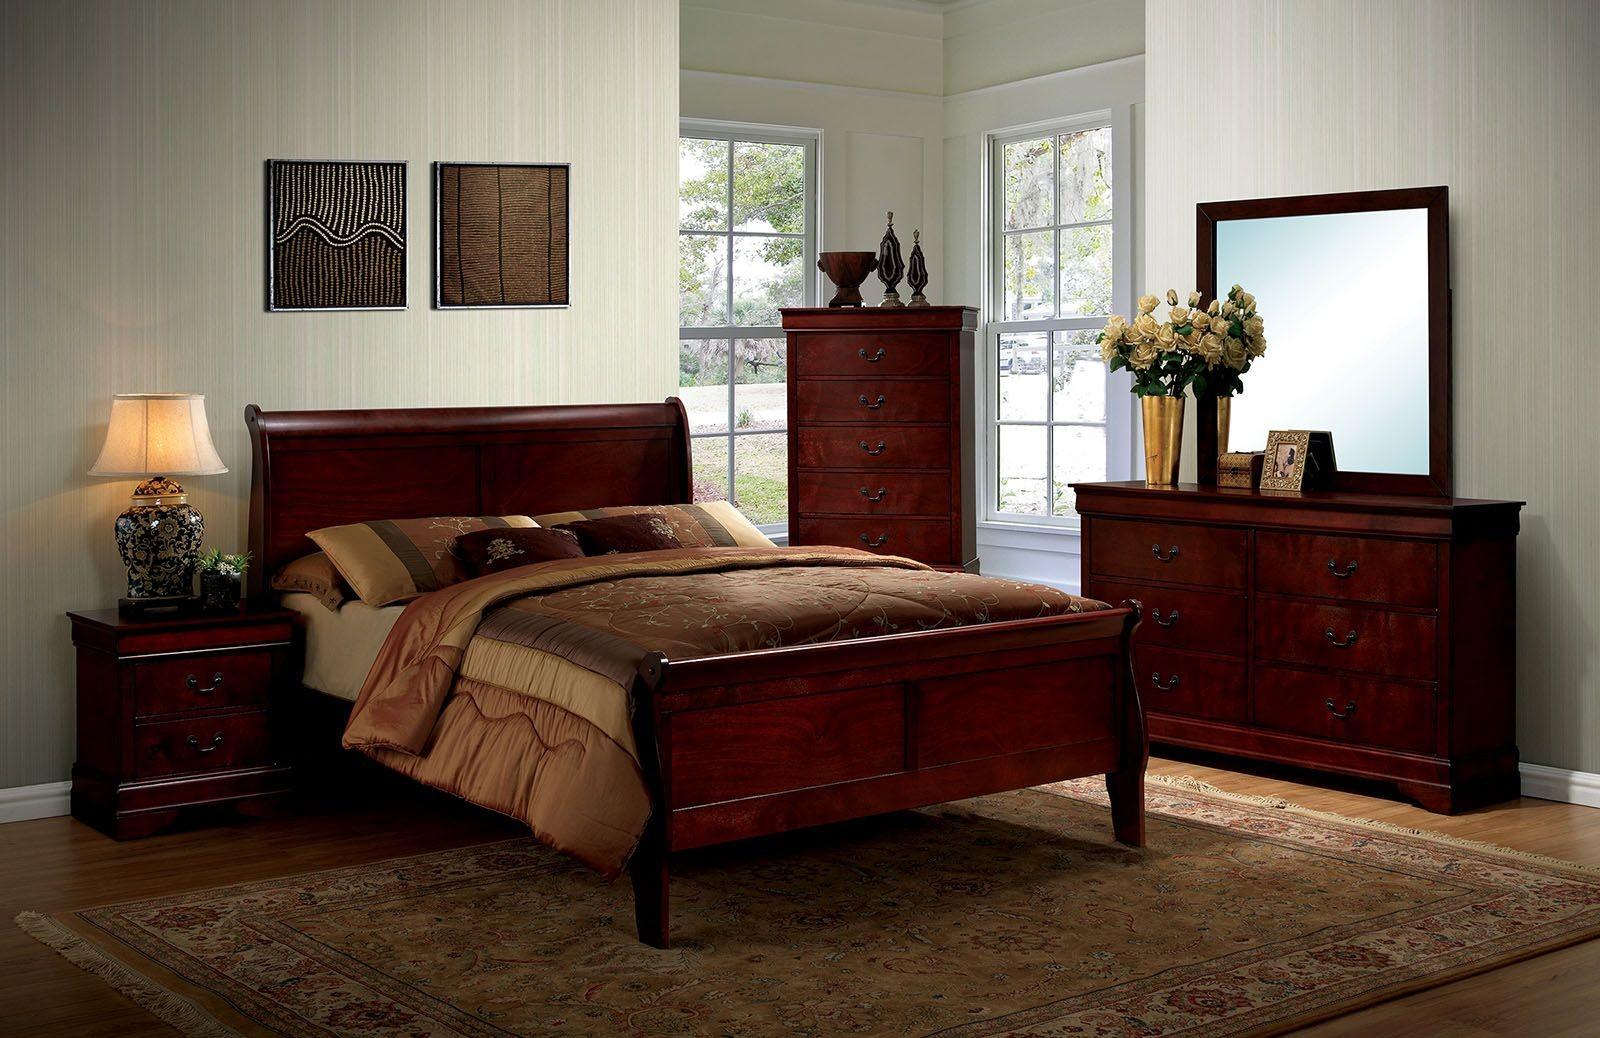 Louis philippe iii cherry panel bedroom set 1stopbedrooms - Louis philippe bedroom collection ...